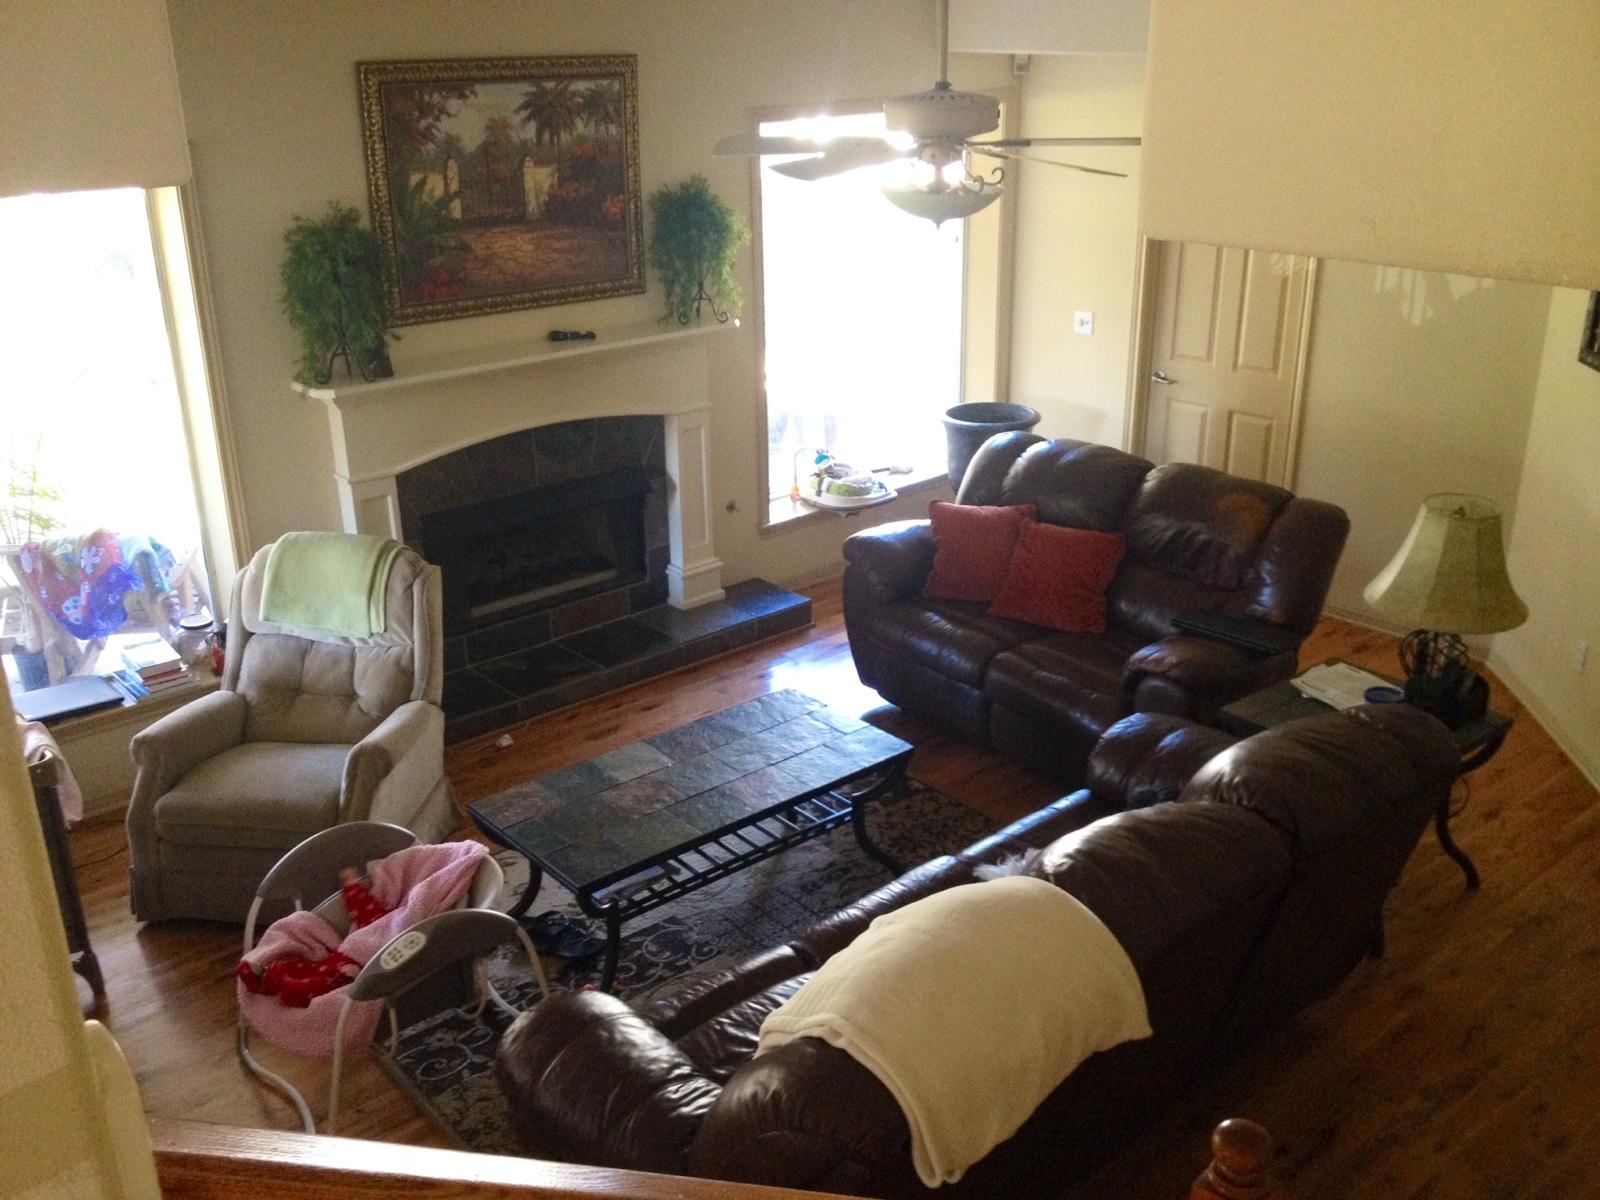 Okay everyone, I need help decorating!!! (mirror, fireplace, paint ...